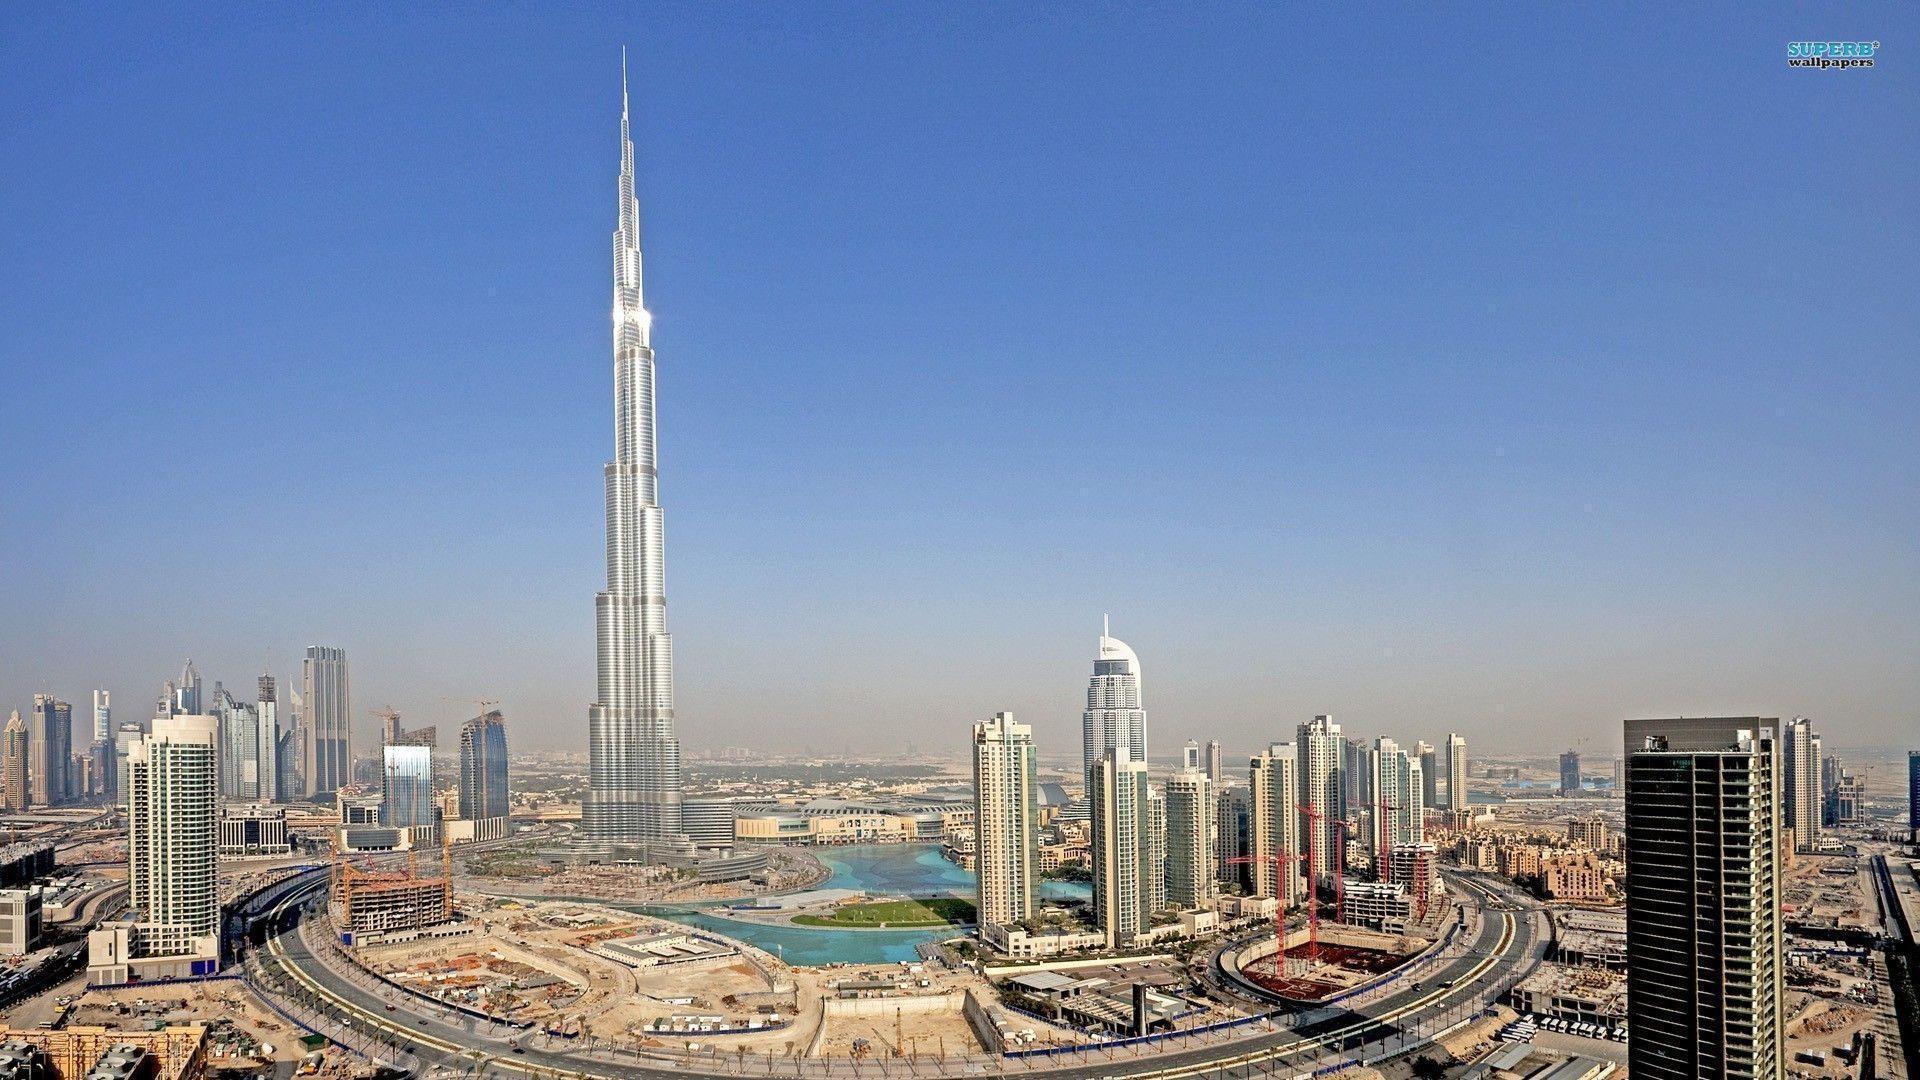 burj khalifa images